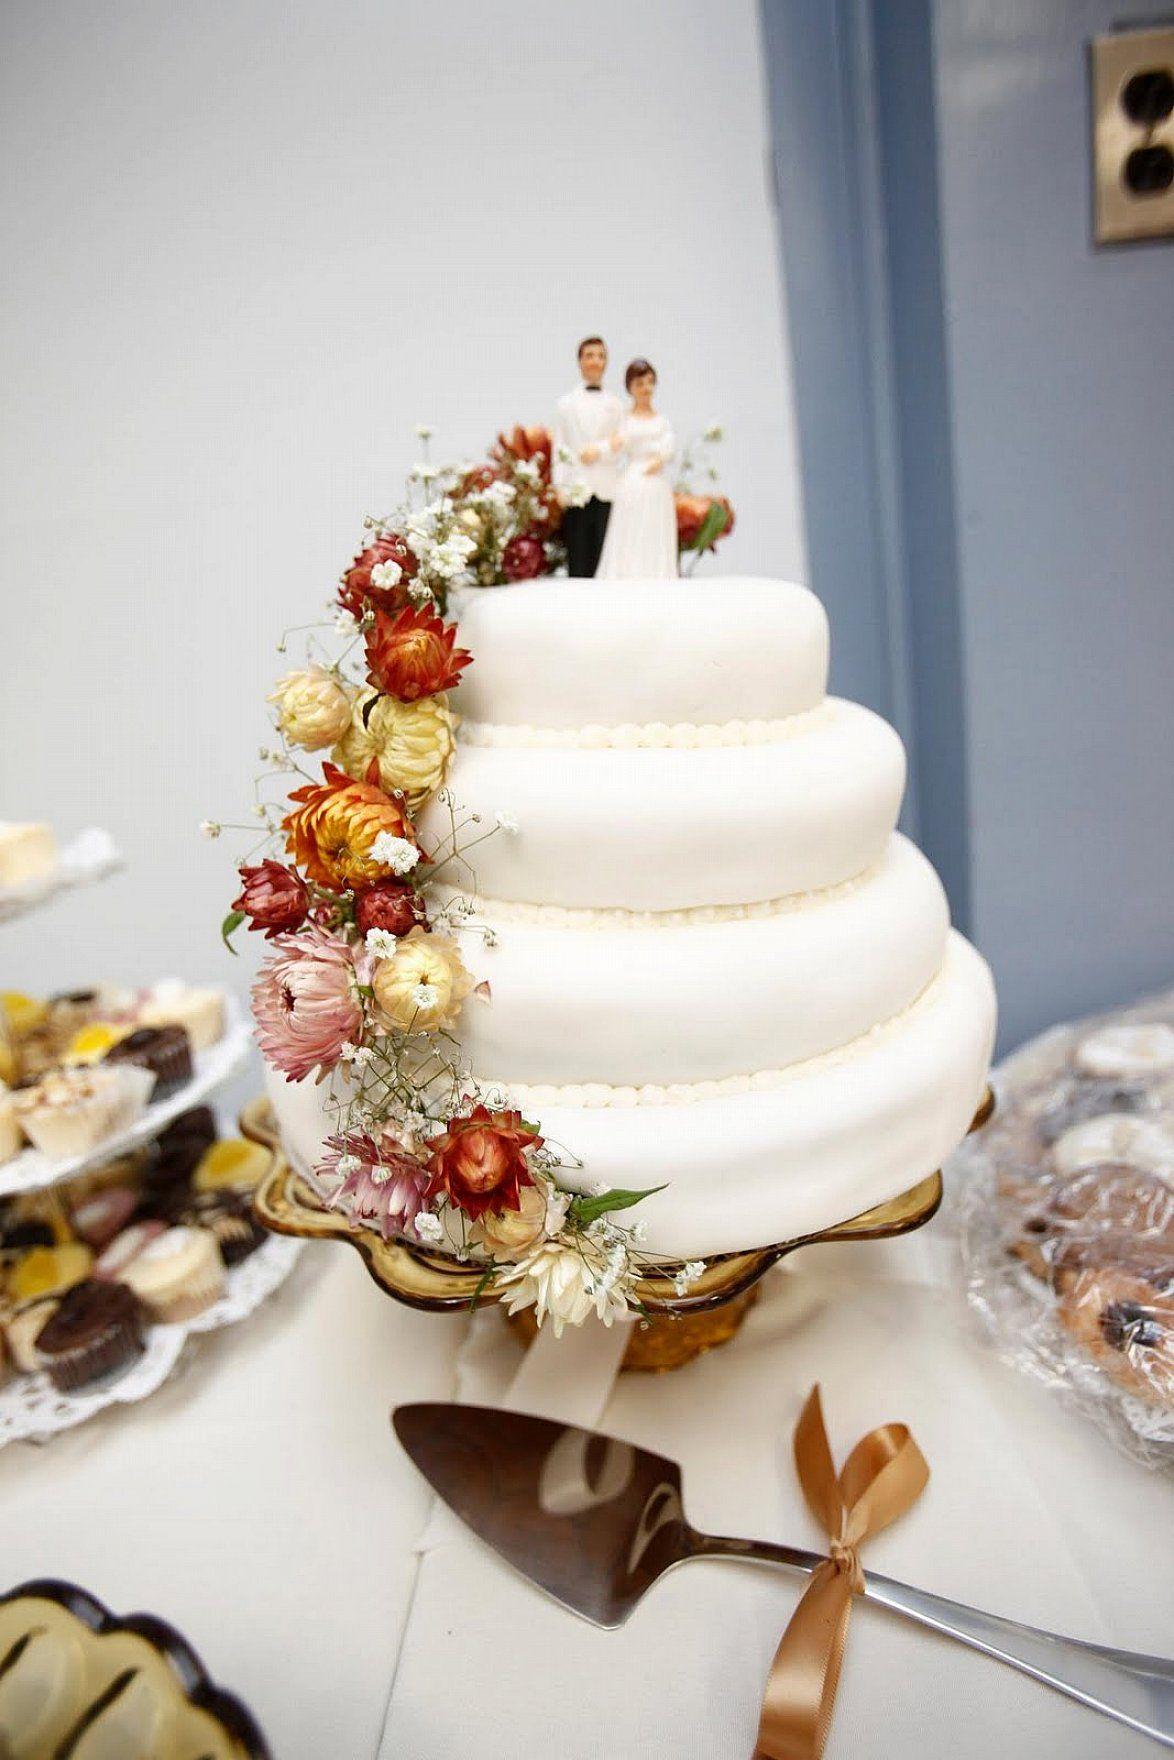 Cheap Wedding Cakes Online | 3 Tier Wedding Cake Pictures | Wedding ...